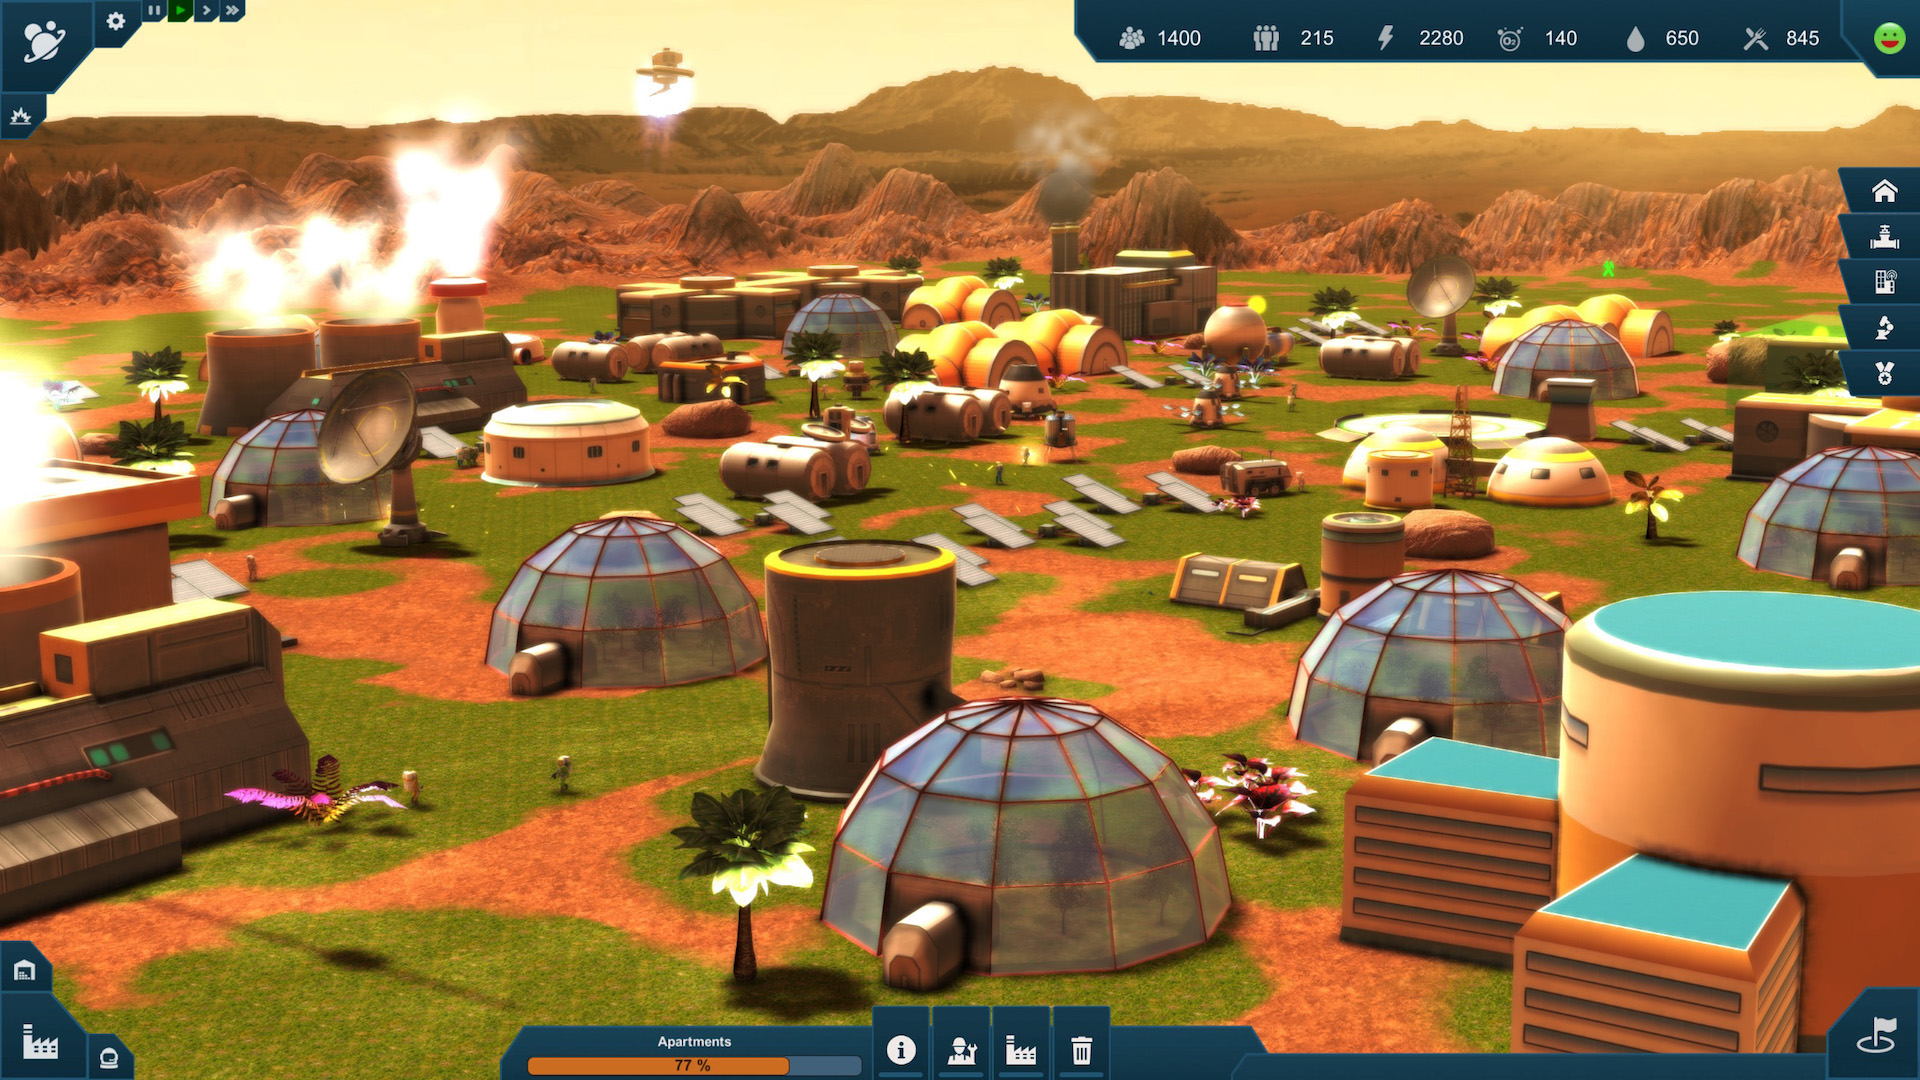 Earth Space Colonies Screenshot 1